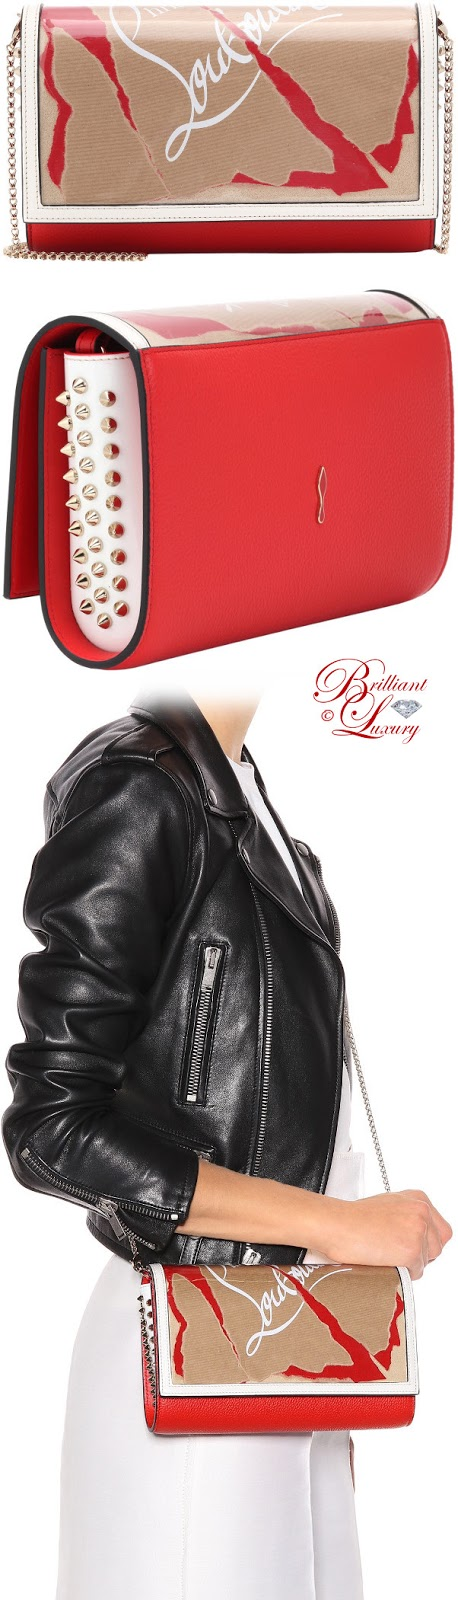 Brilliant Luxury ♦ Christian Louboutin Paloma Loubikraft leather clutch 2018